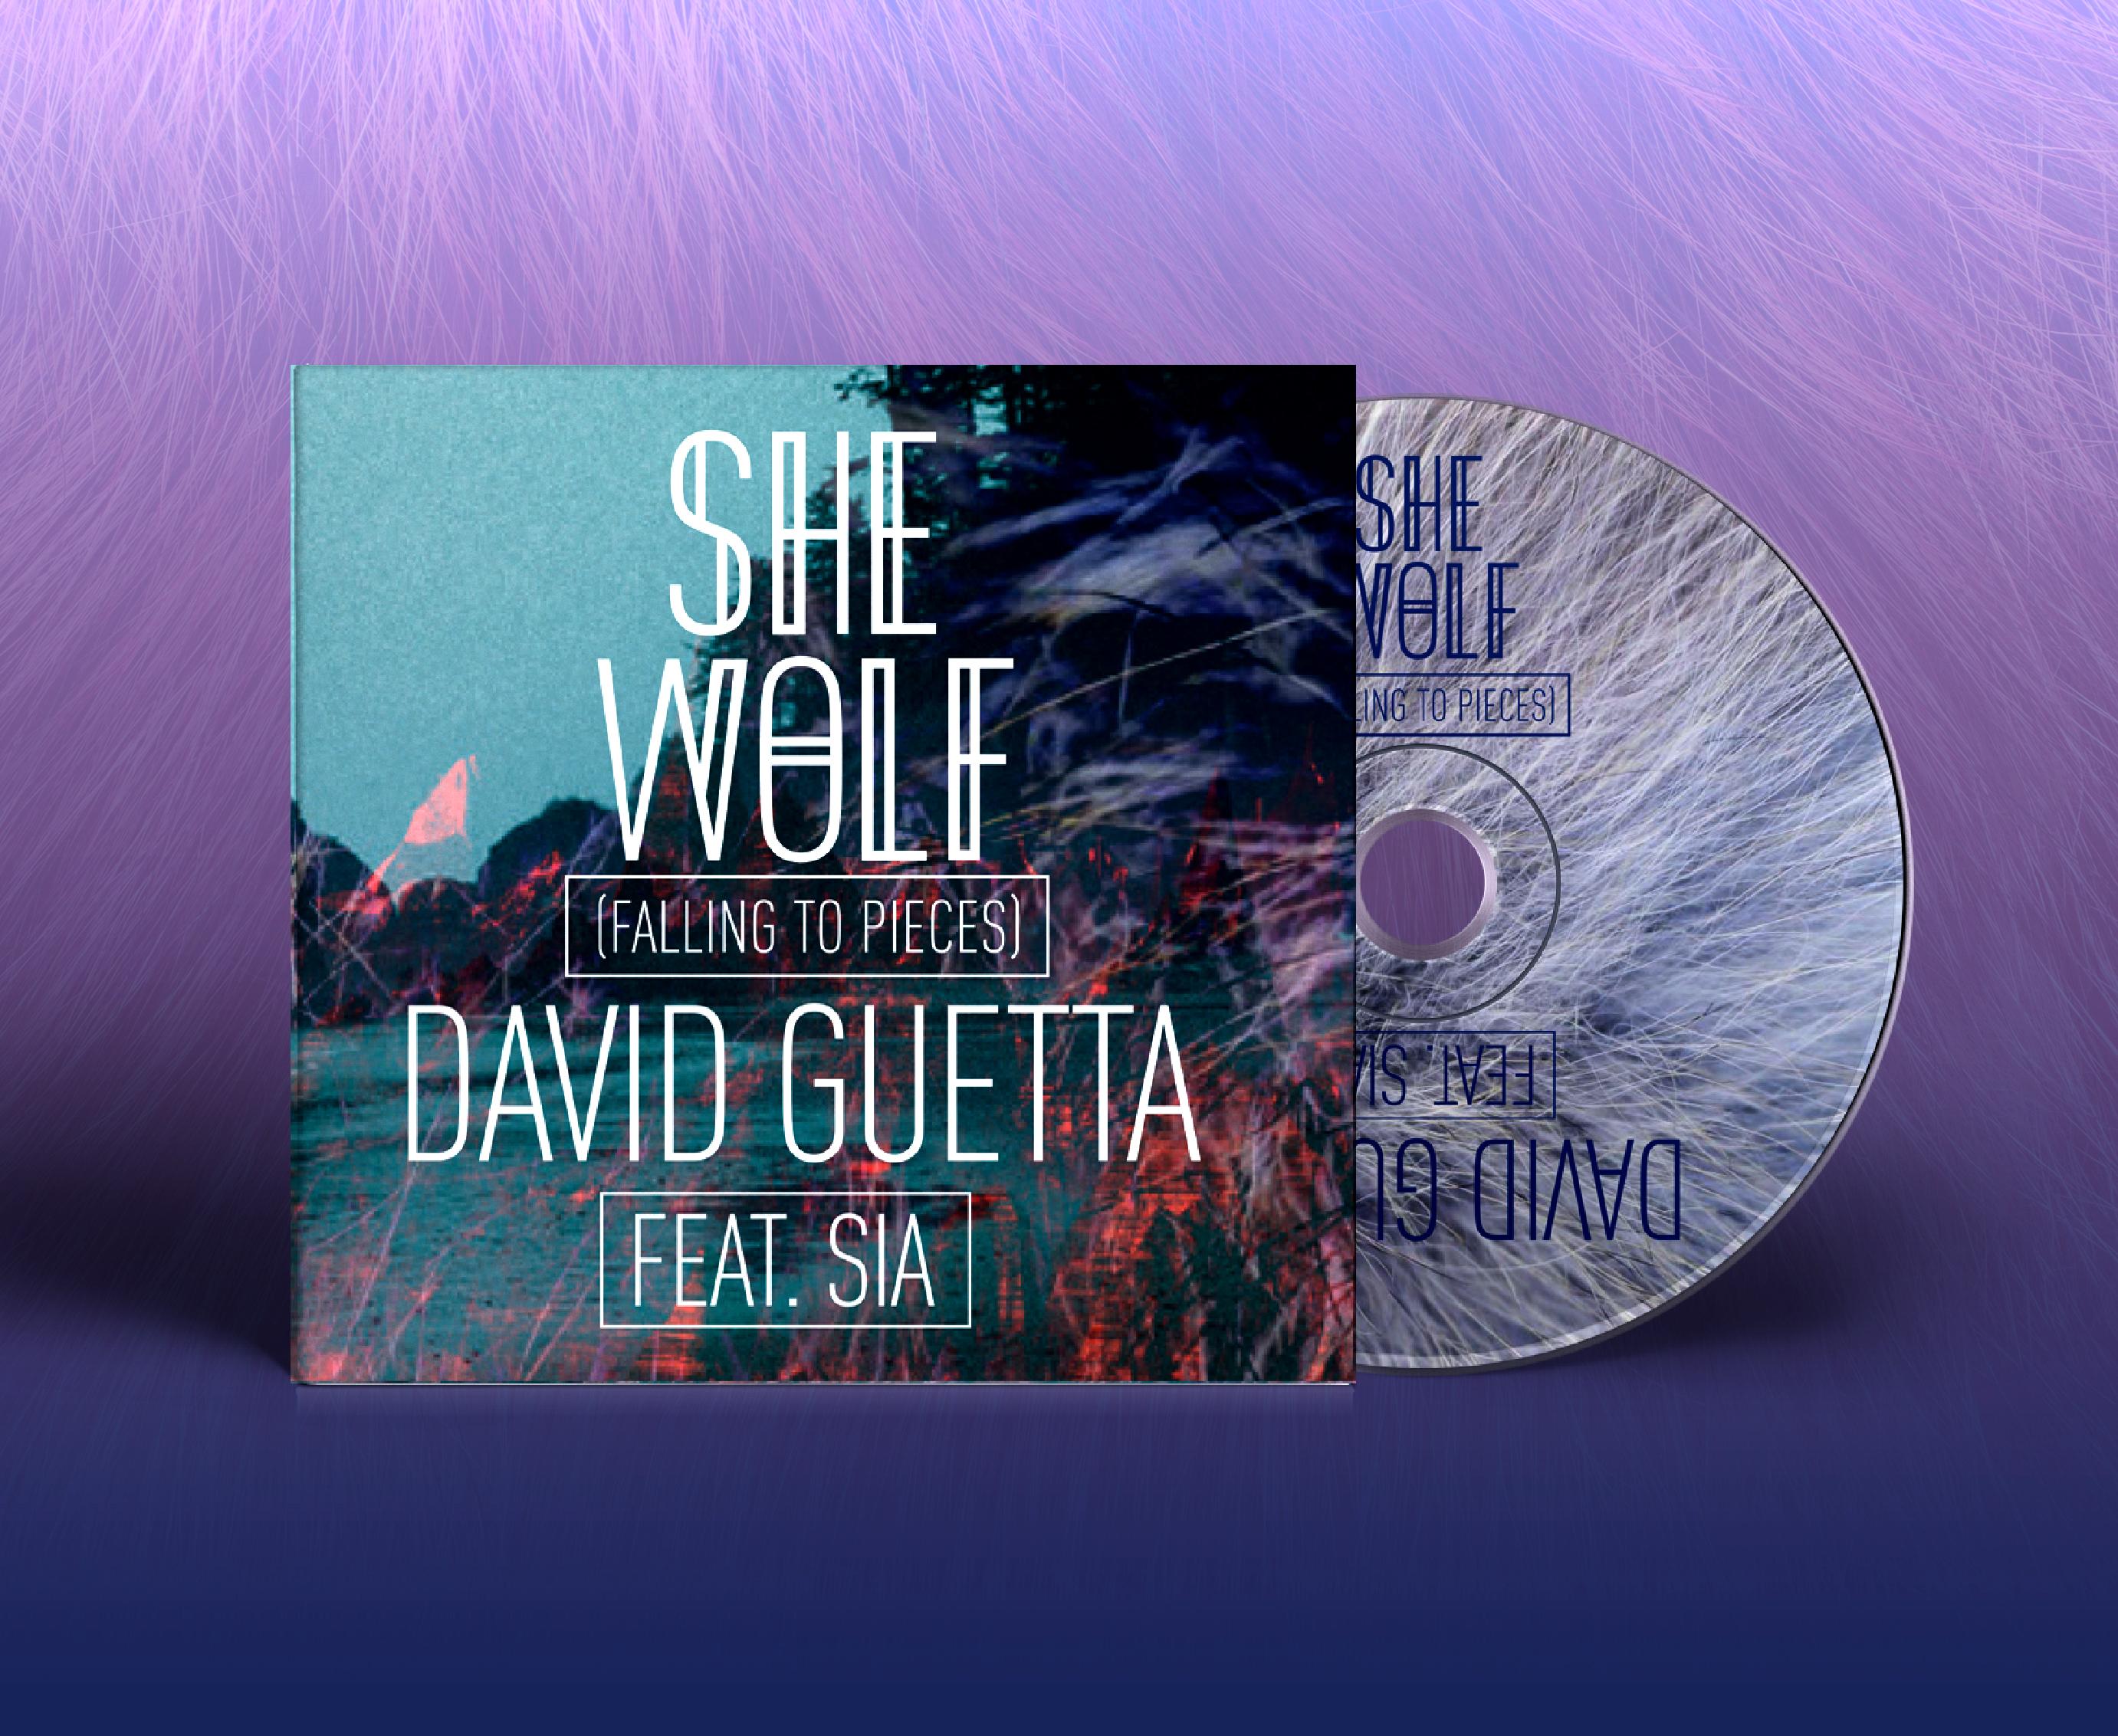 She Wolf album cover